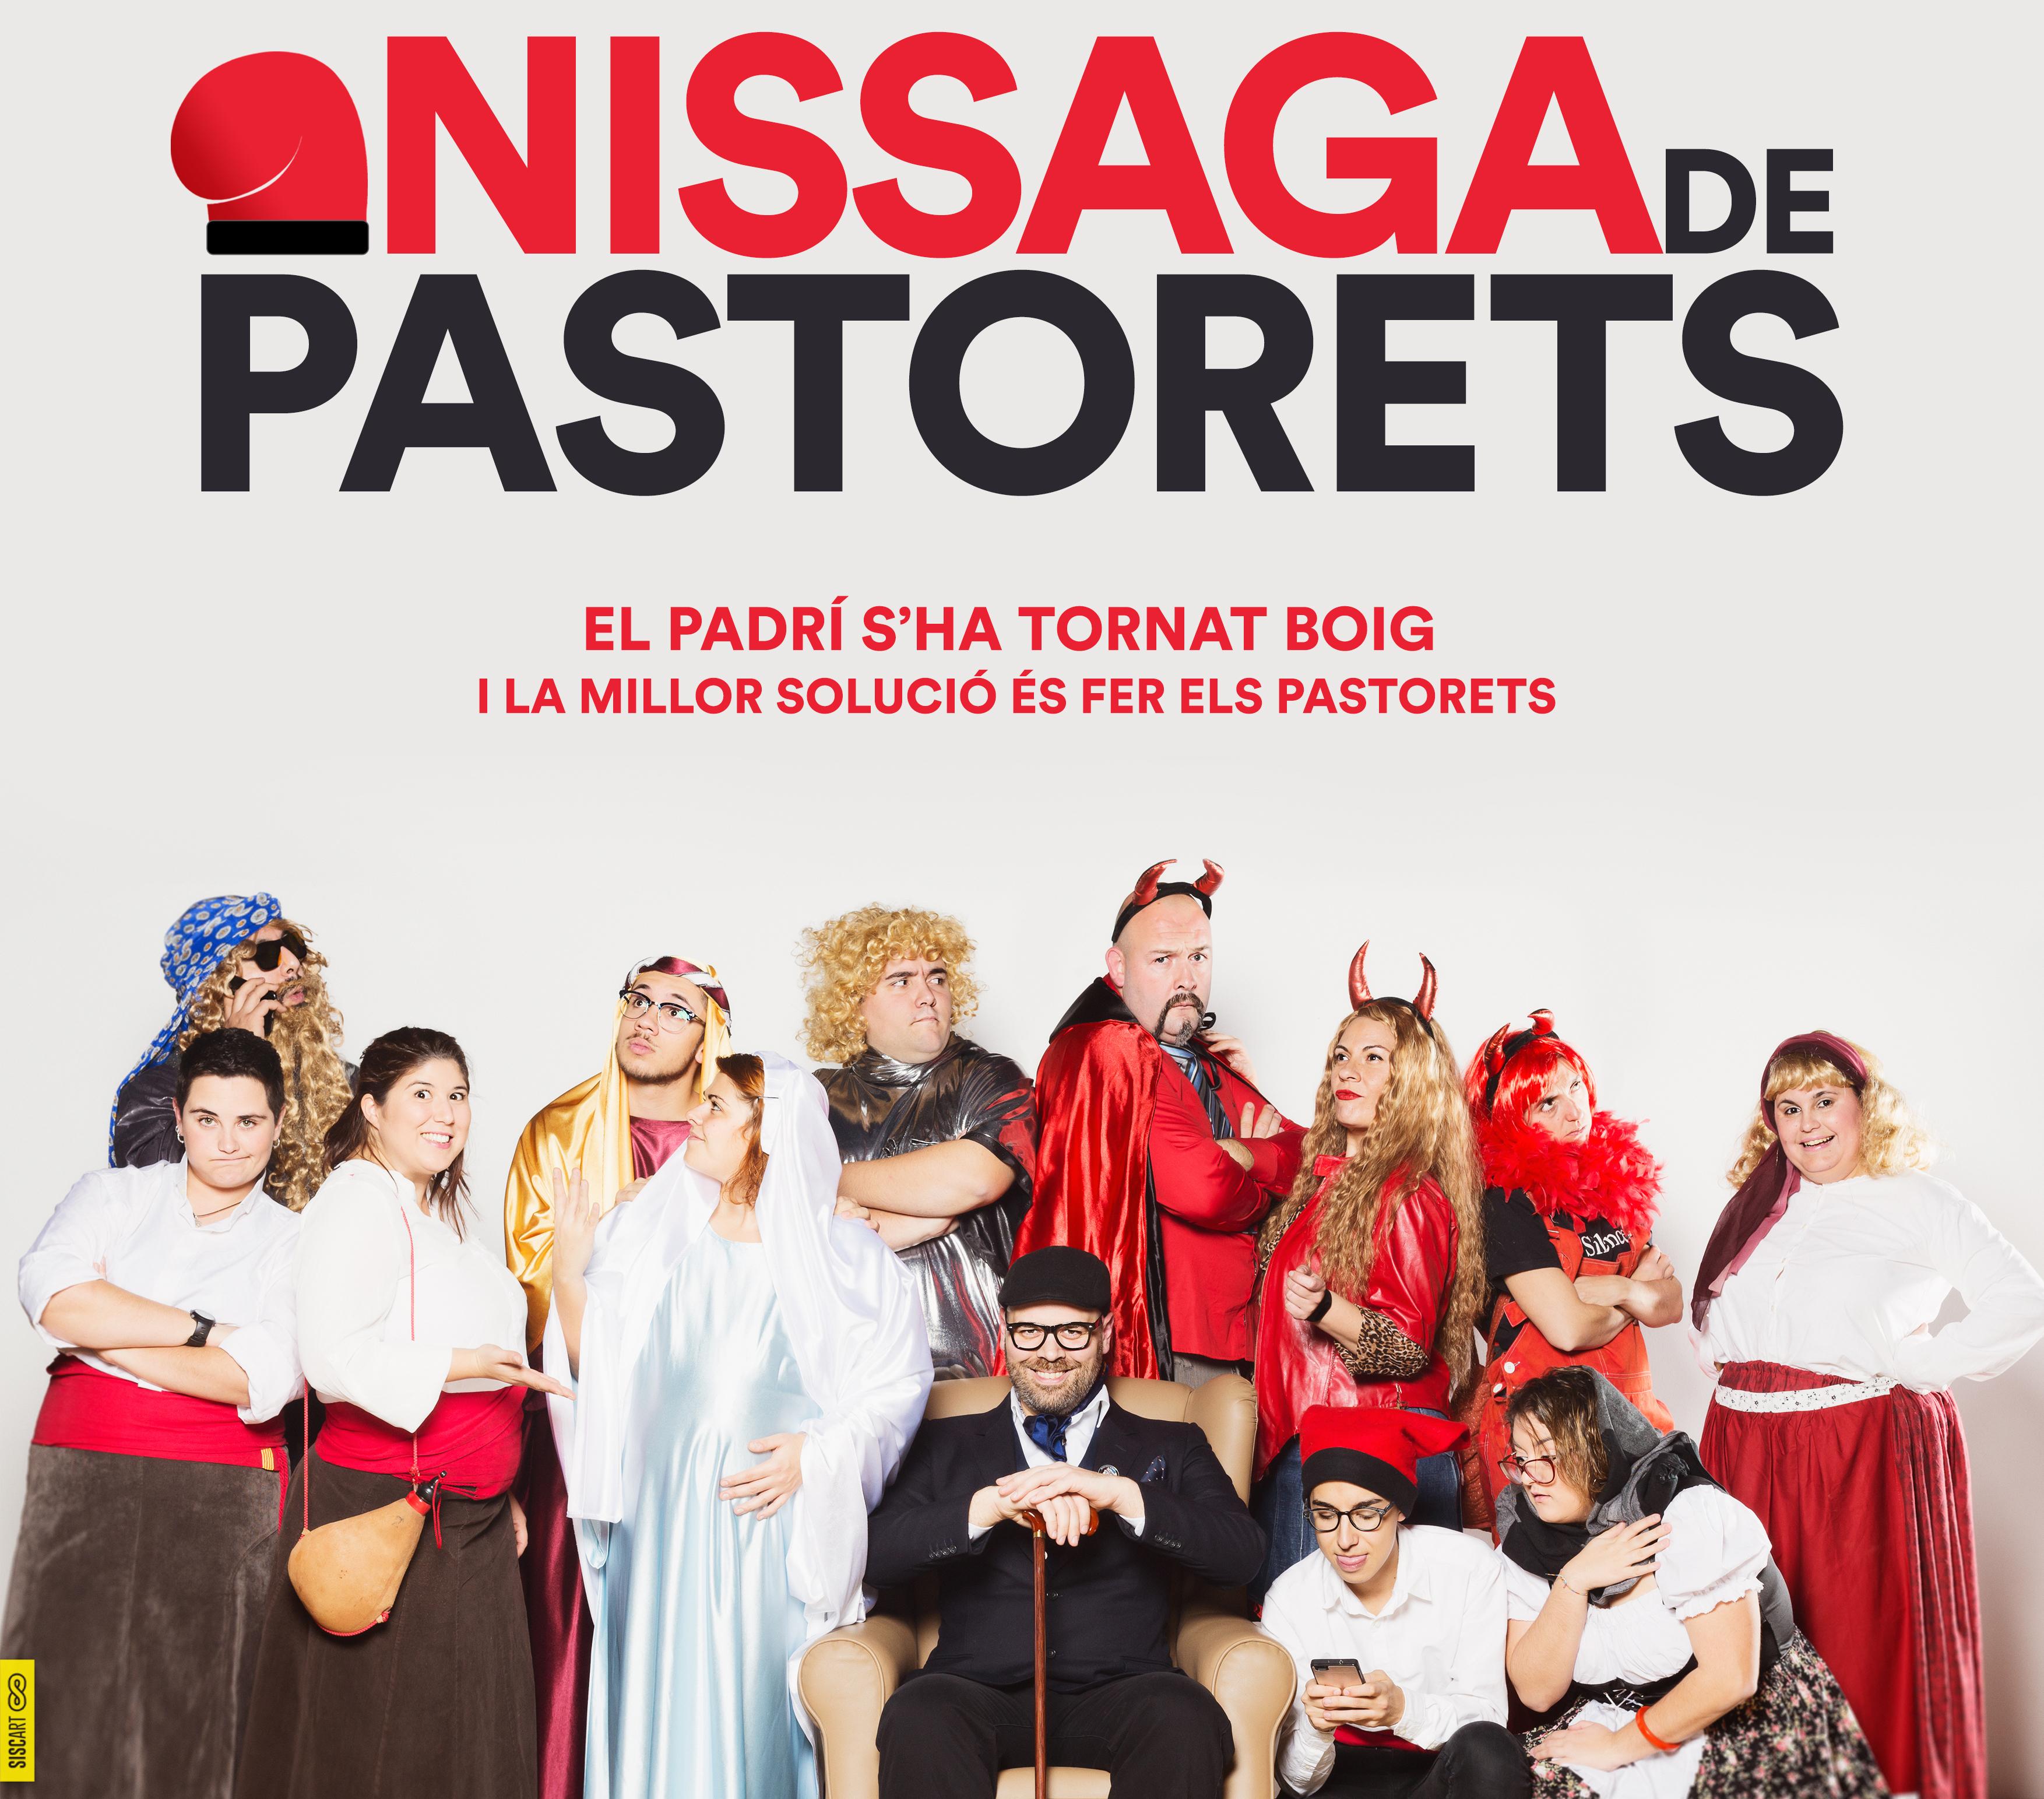 Nissaga de Pastorets al Youtube